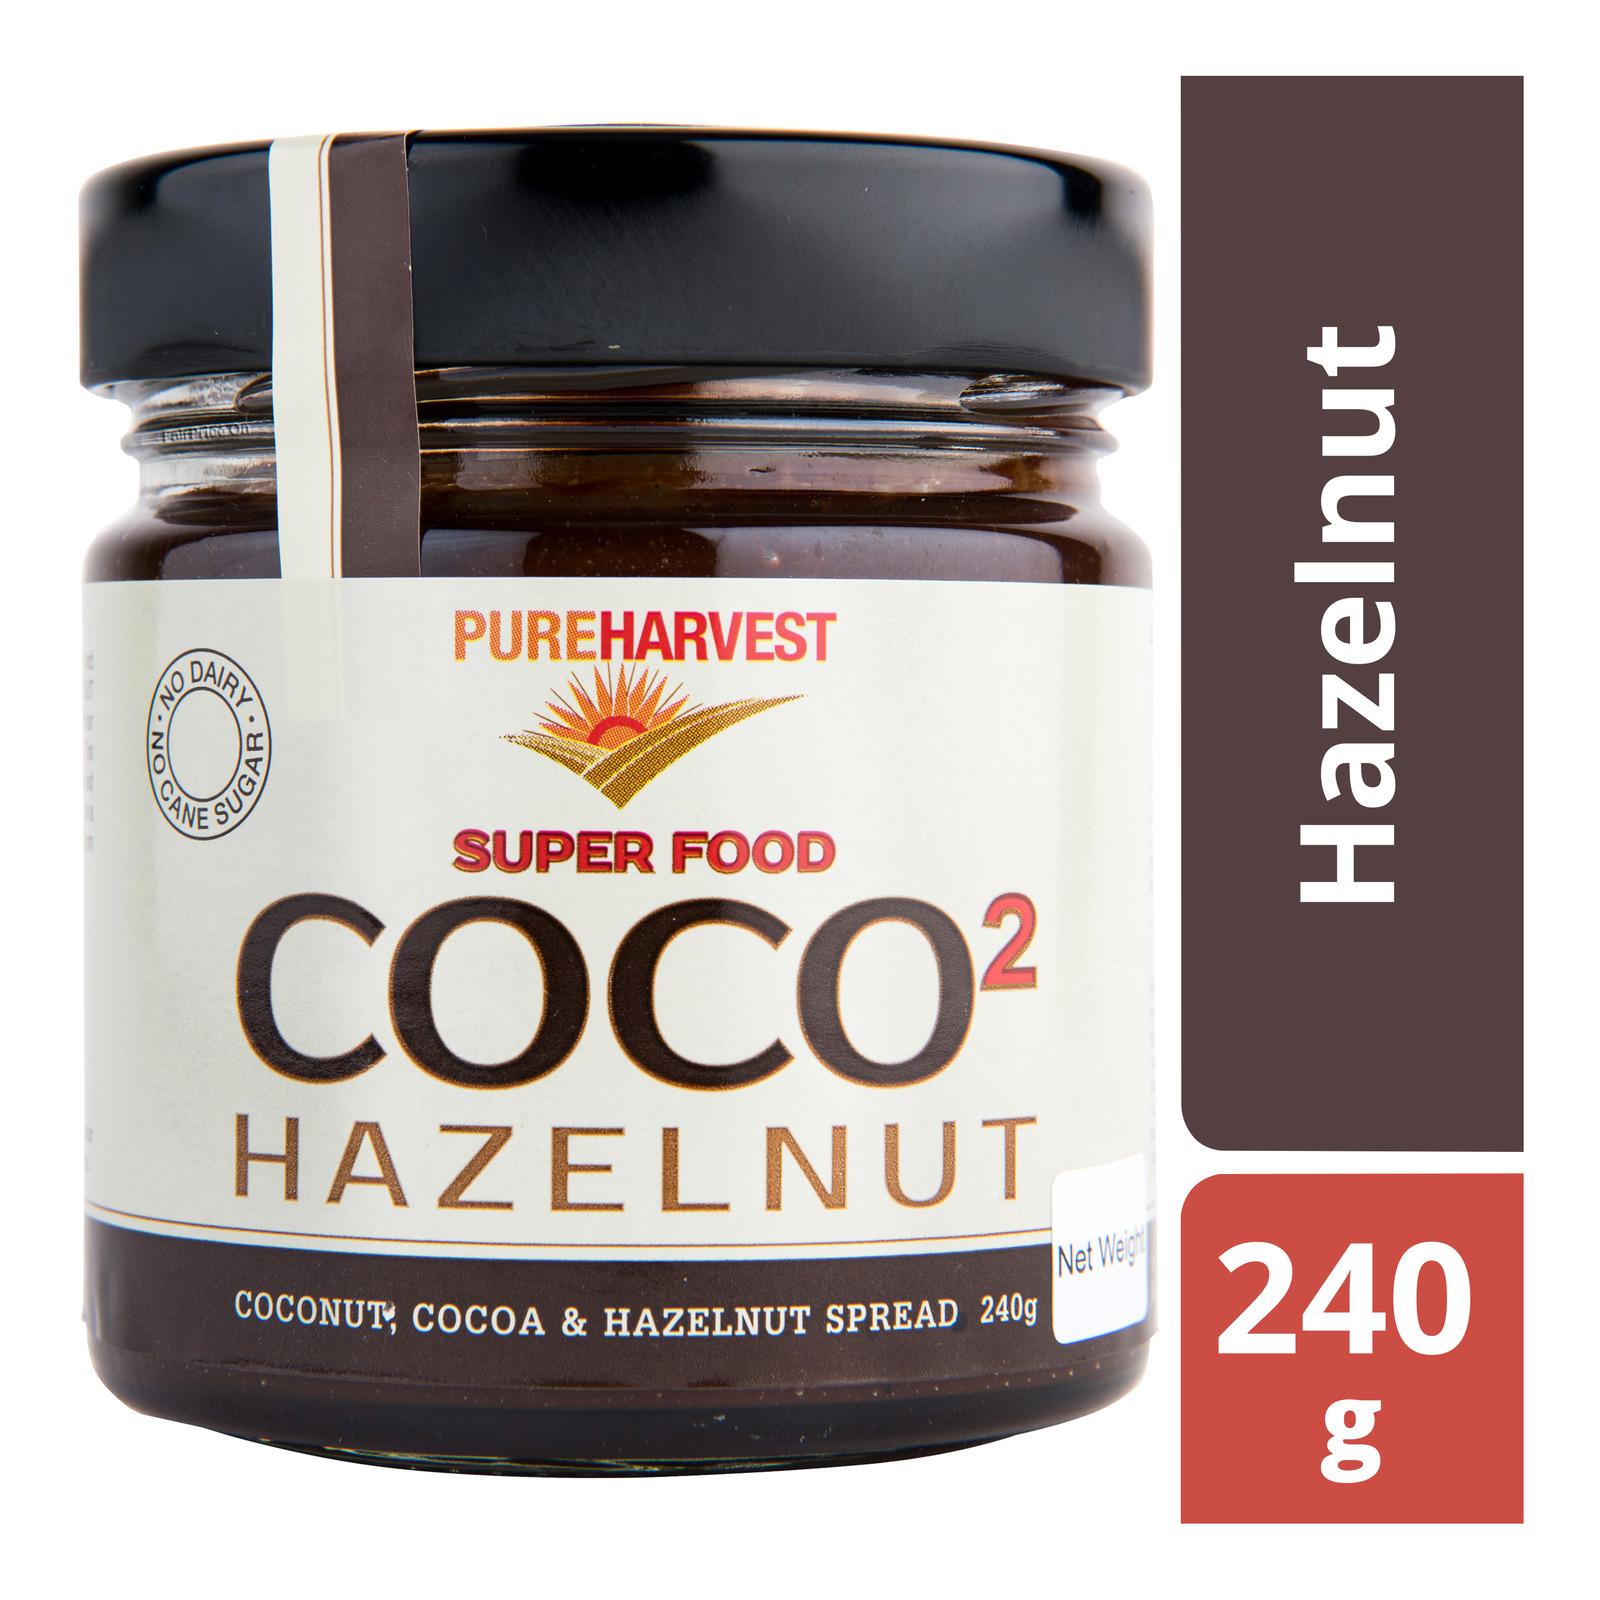 Pureharvest Super Food Coco2 Spread - Hazelnut